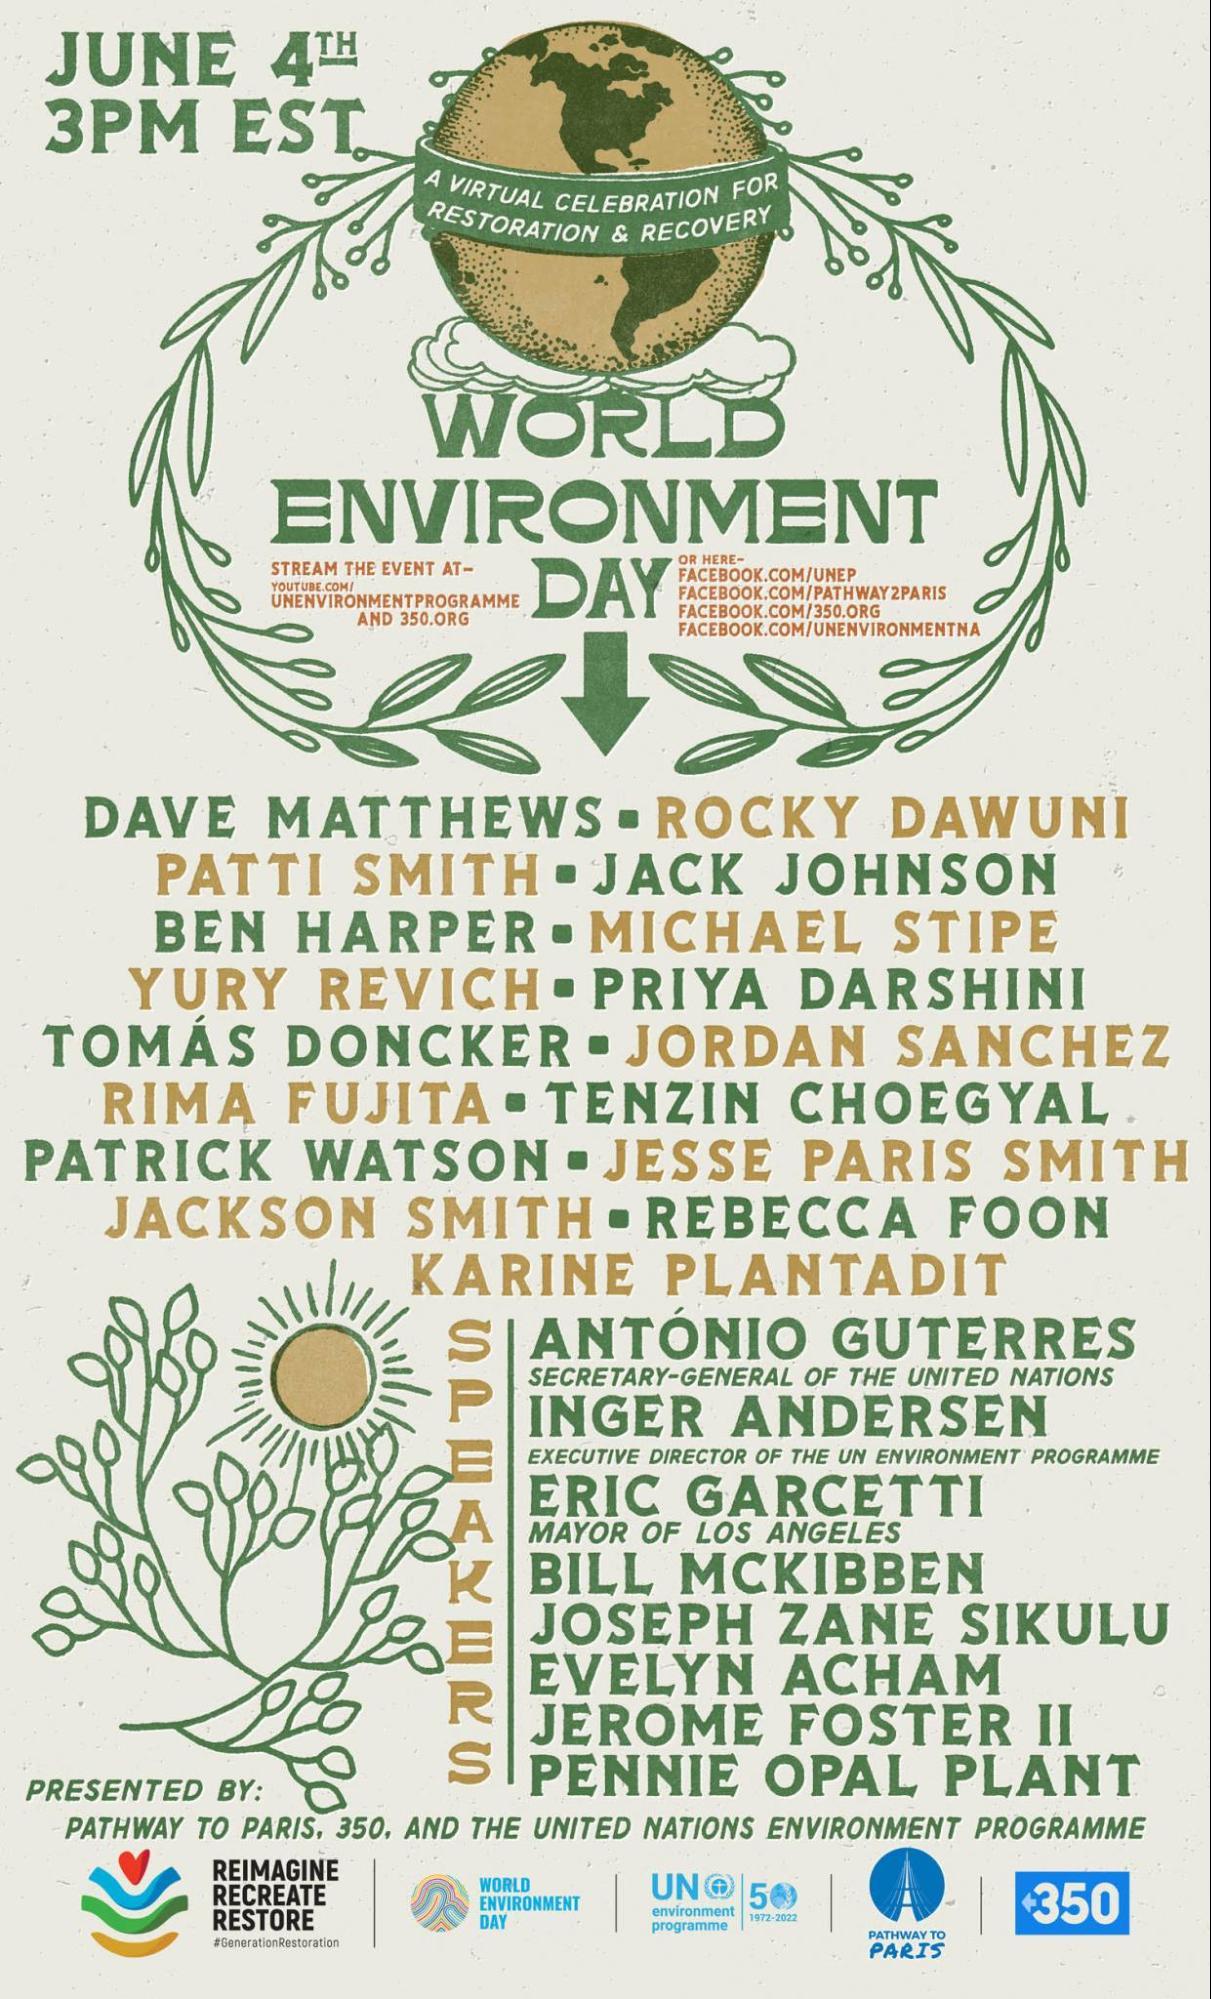 World Environment Day. 350.org